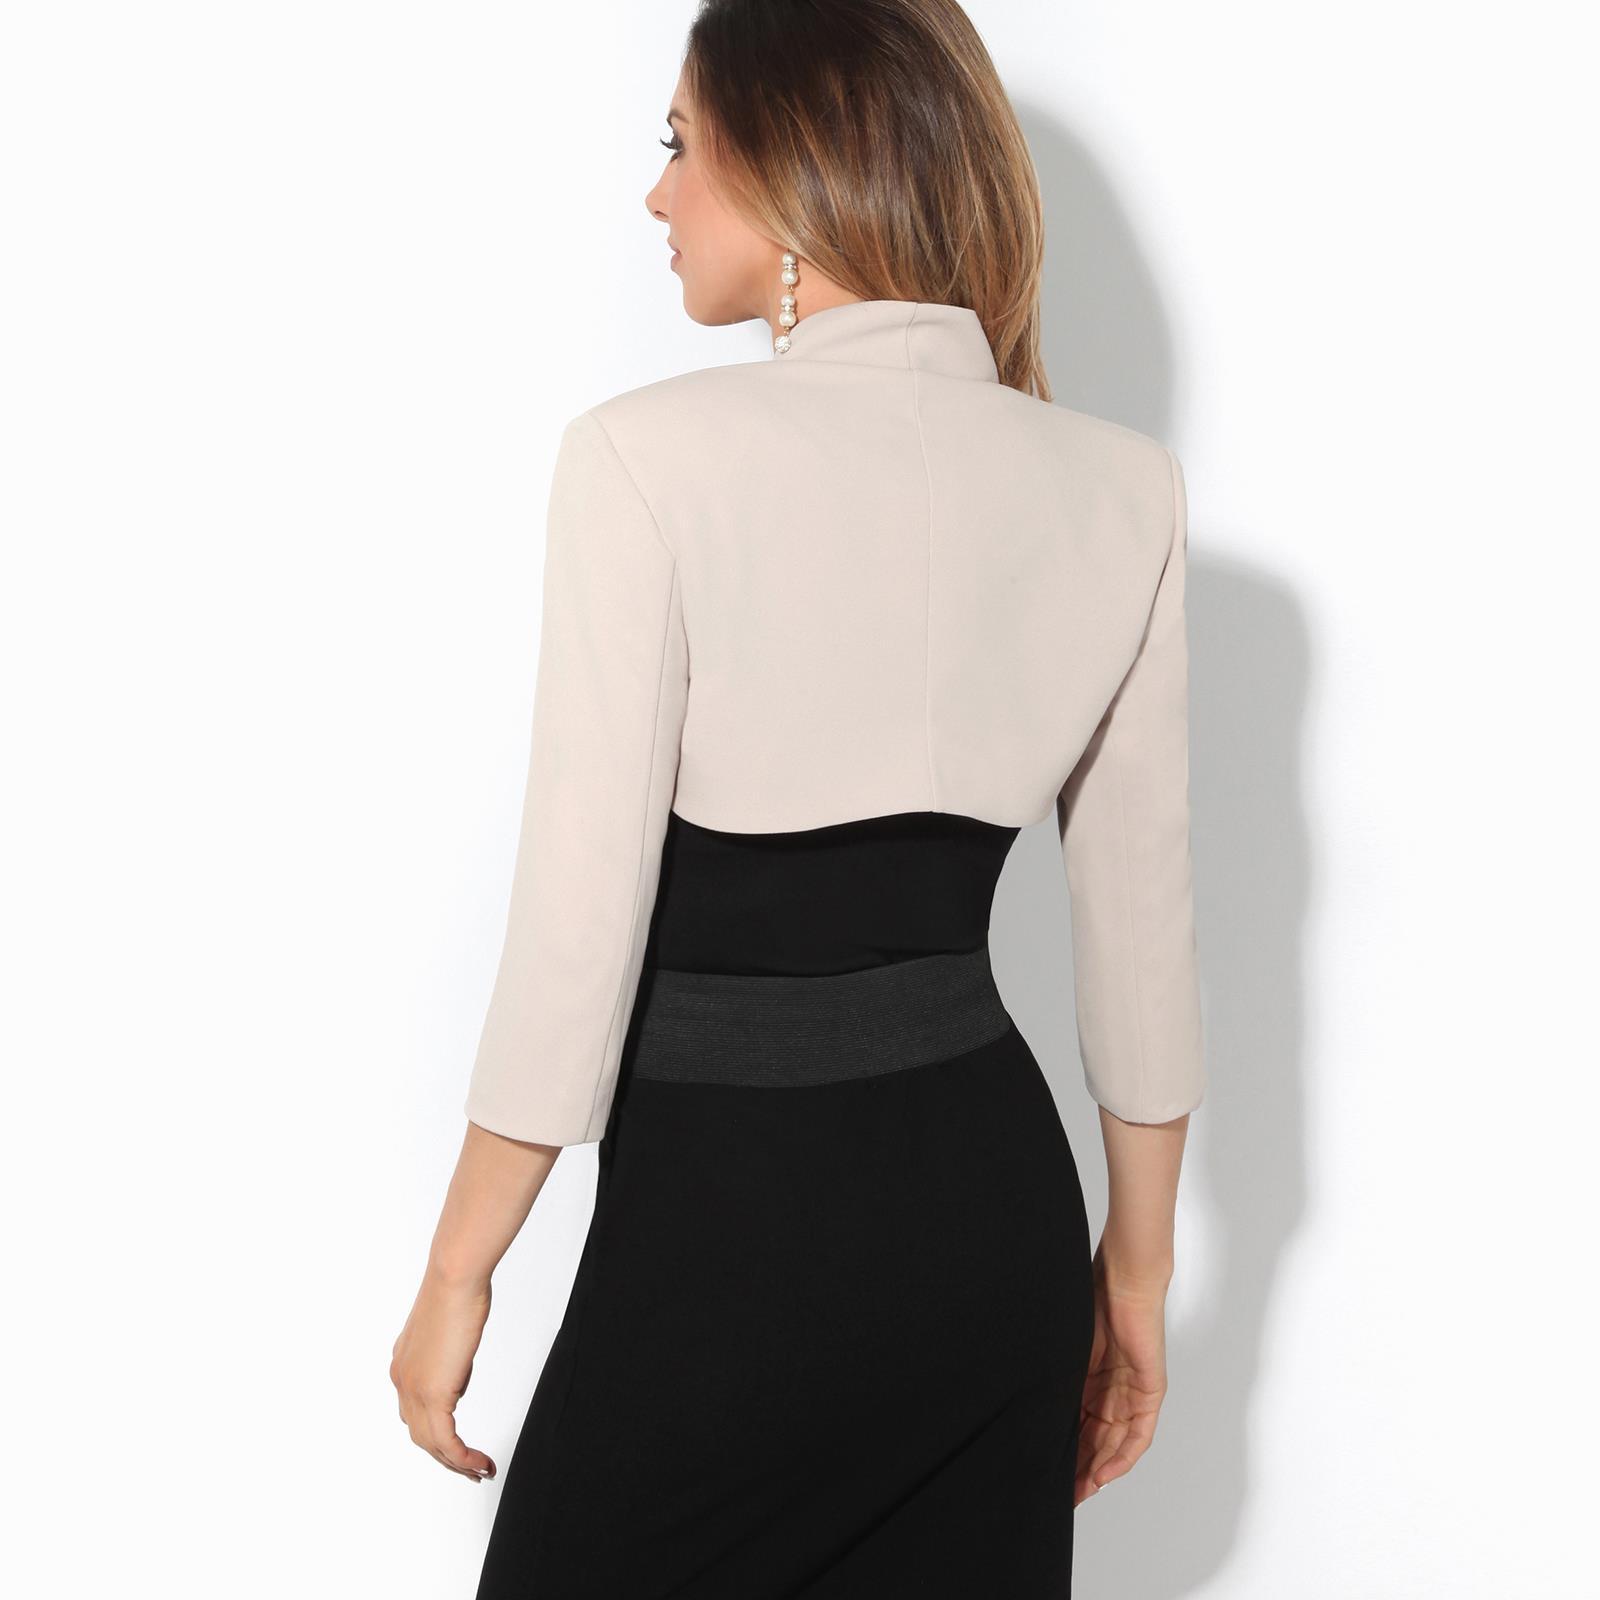 Womens-Tailored-Bolero-Shrug-Cropped-Top-Short-Sleeve-Party-Blazer-Jacket-Coat thumbnail 22